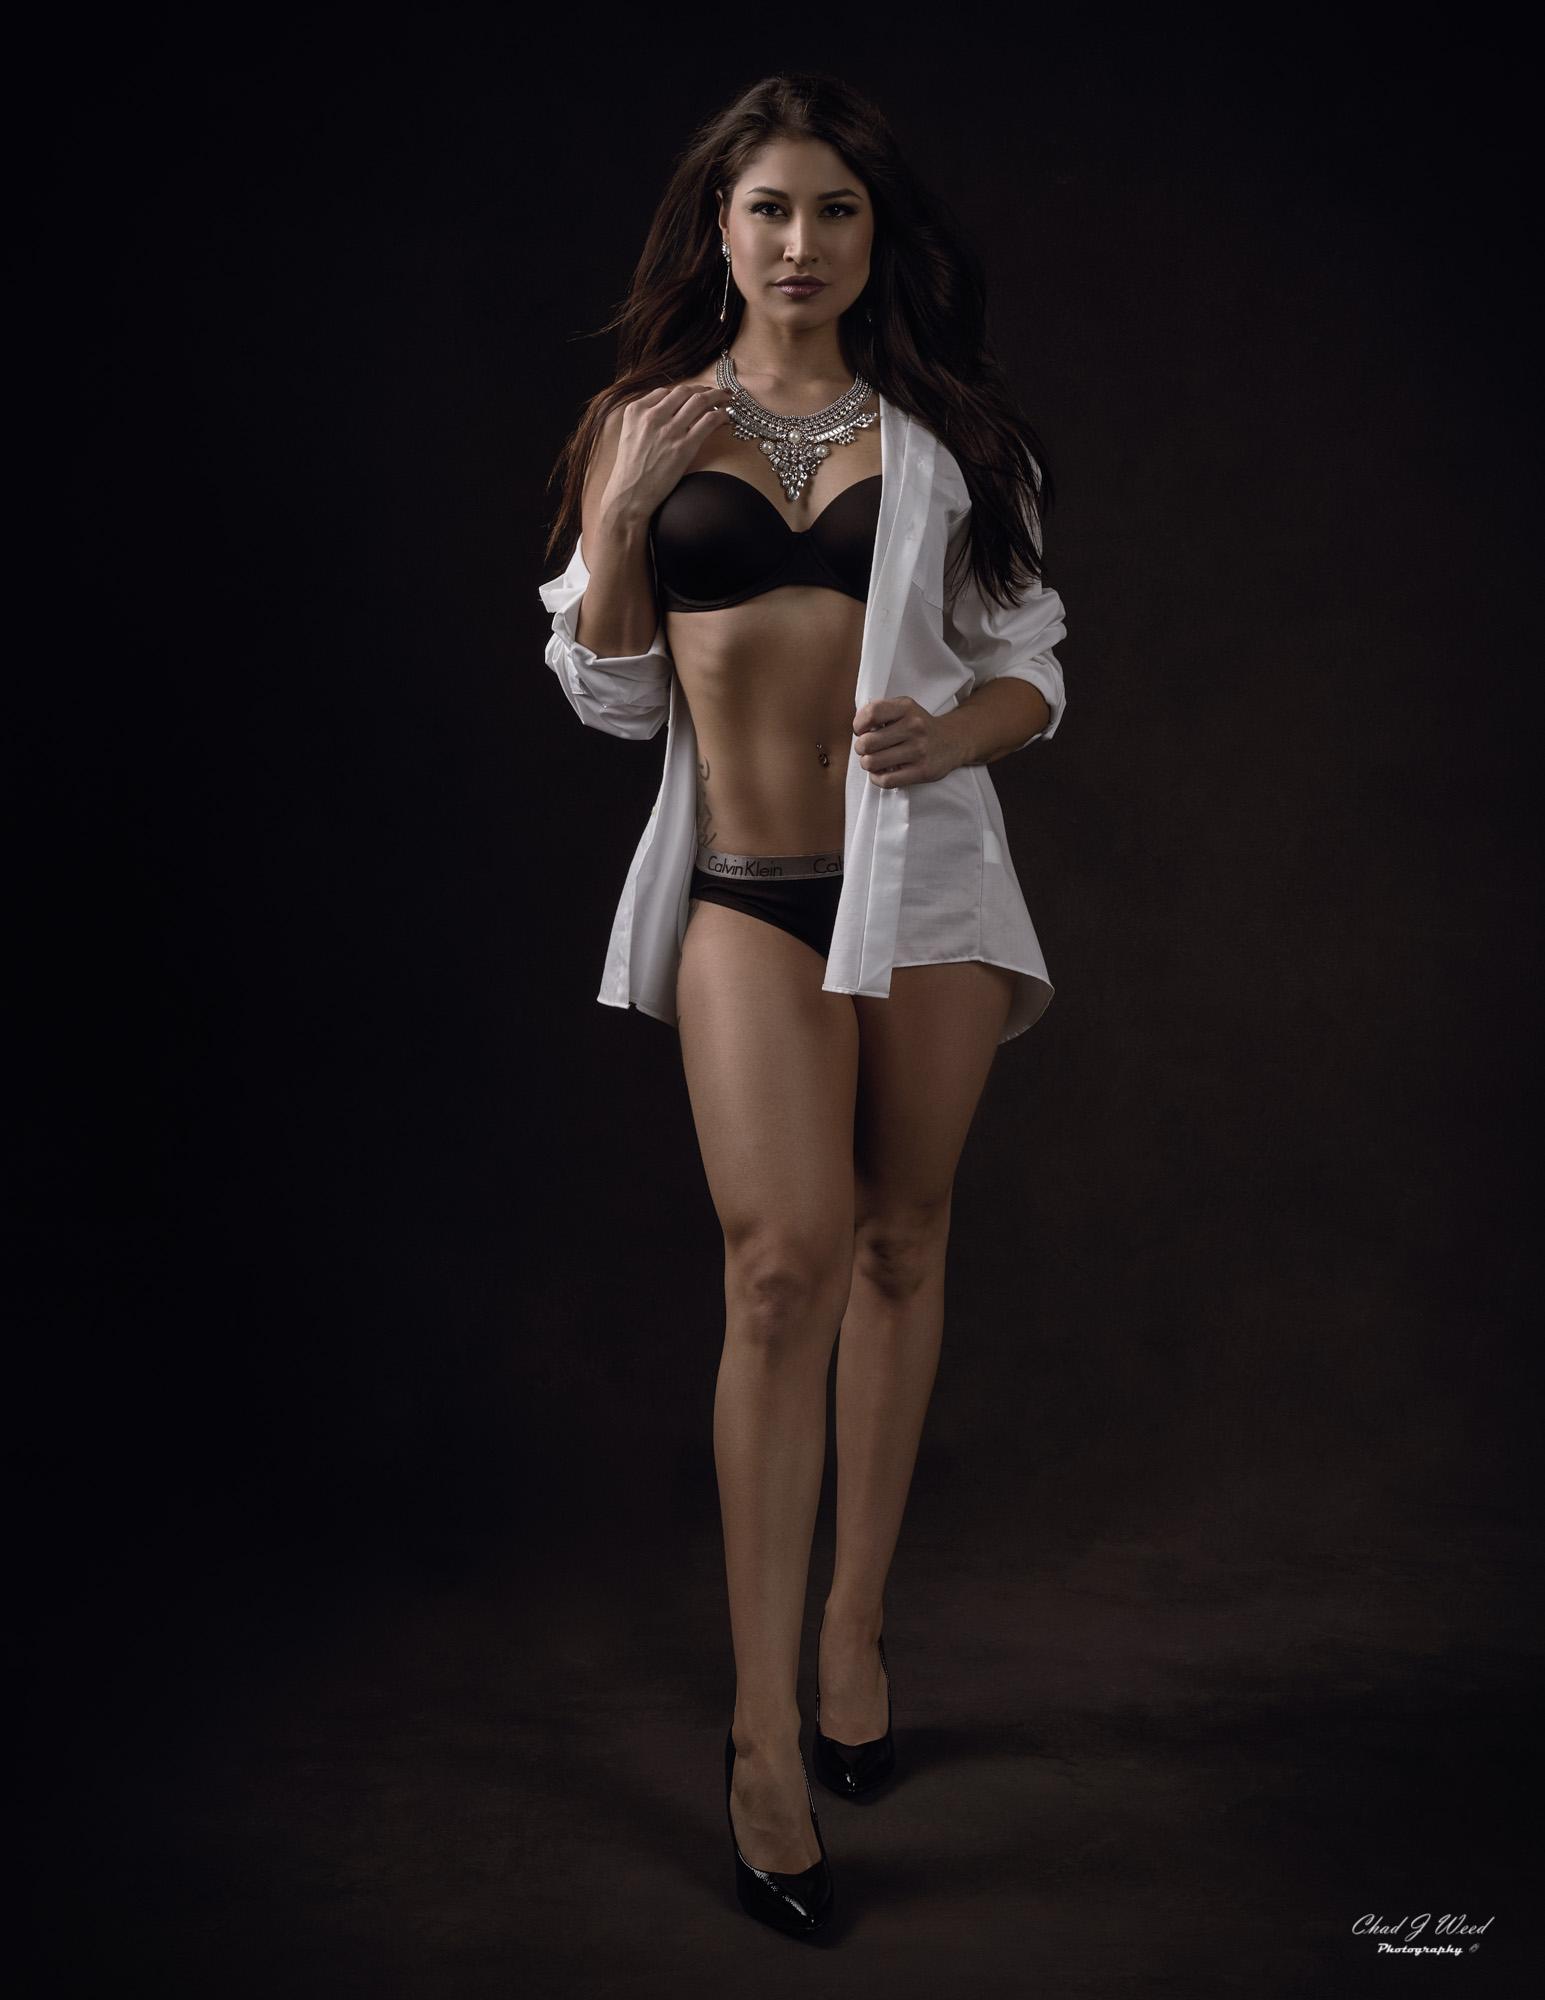 Arizona Fashion Photographer Chad Weed with Fitness Model Ashly - My White Shirt 1